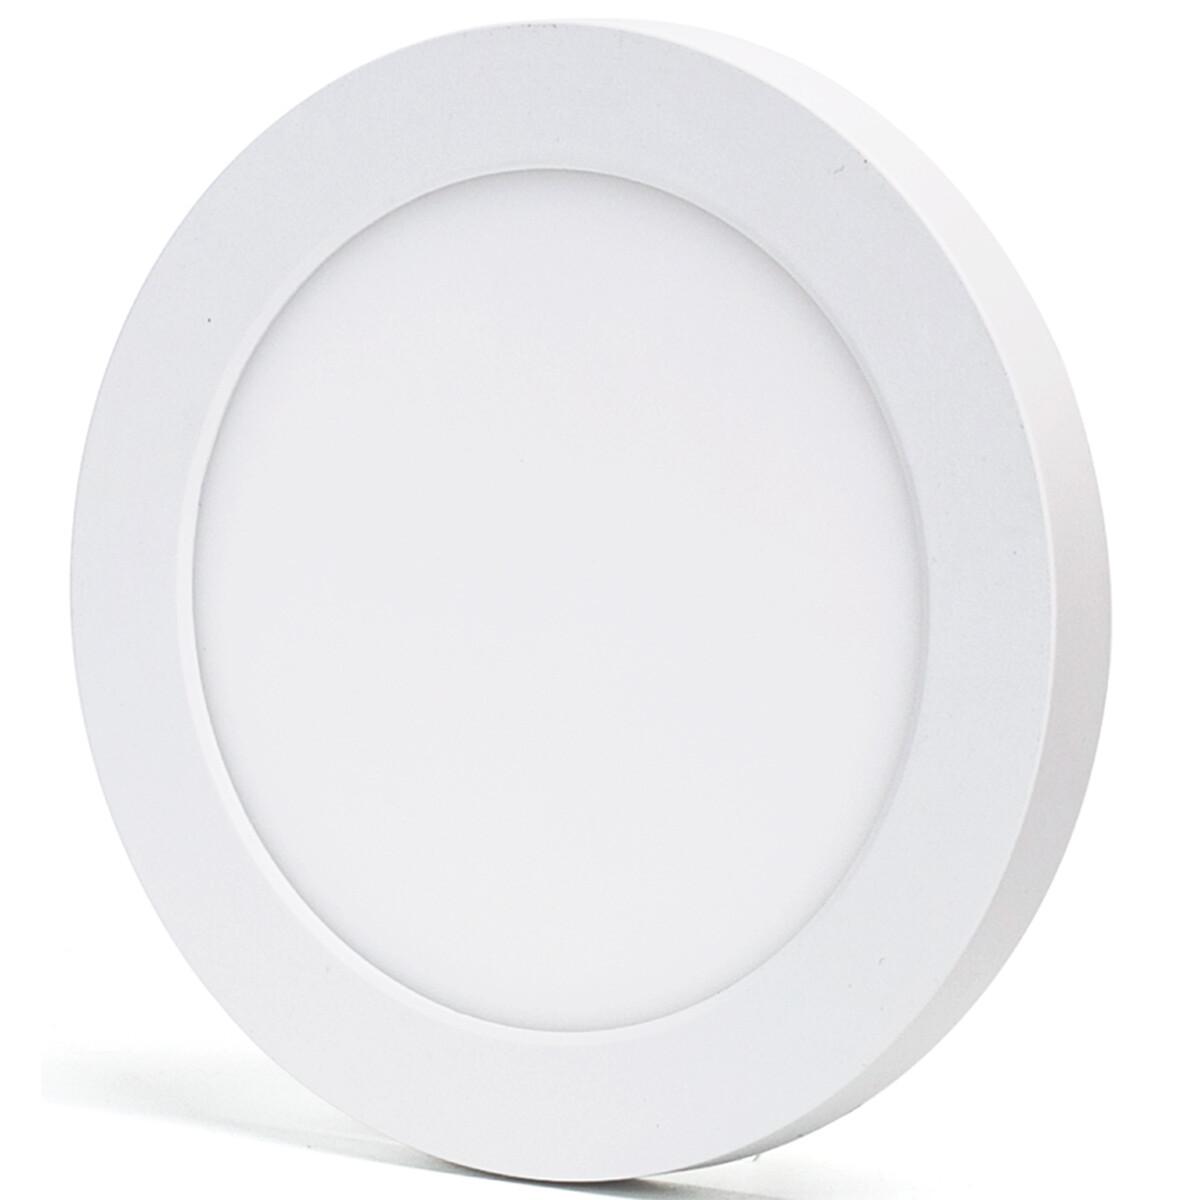 LED Downlight Pro - Aigi Foka - Inbouw/Opbouw - Rond - 12W - Aanpasbare Kleur CCT - Mat Wit - Kunststof